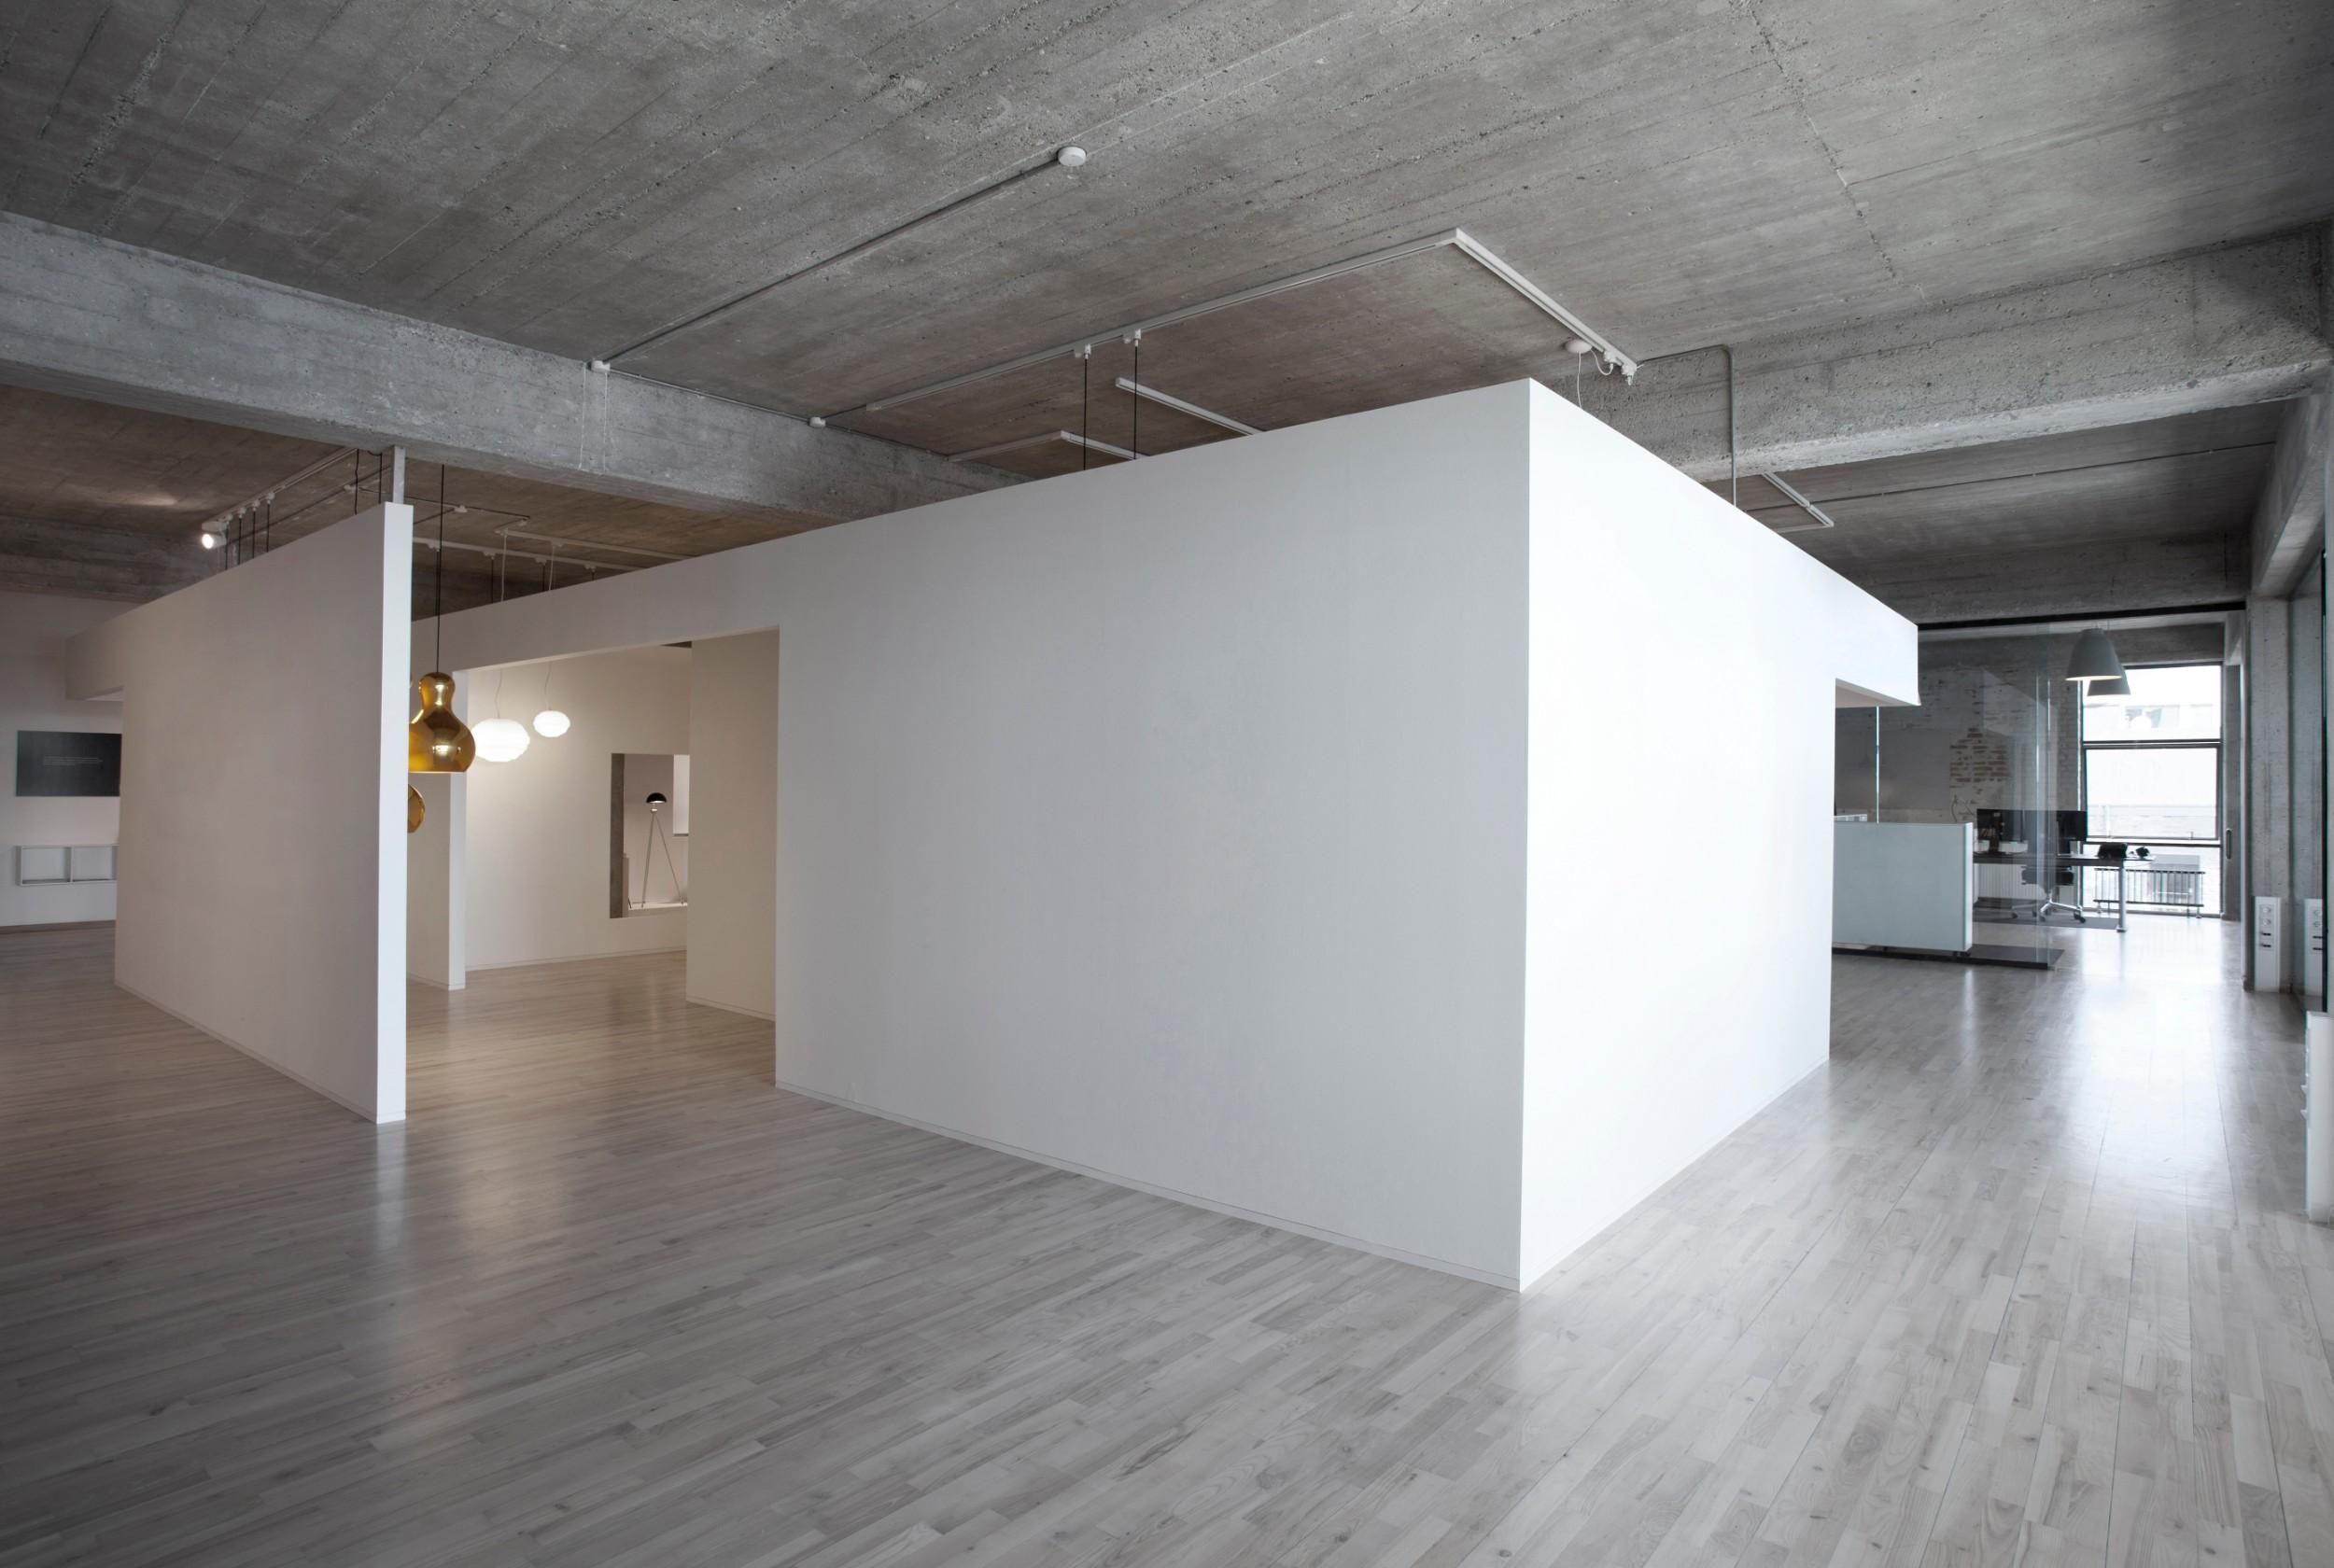 sofie-ladefoged-interior-lightyears-showroom-02.jpg